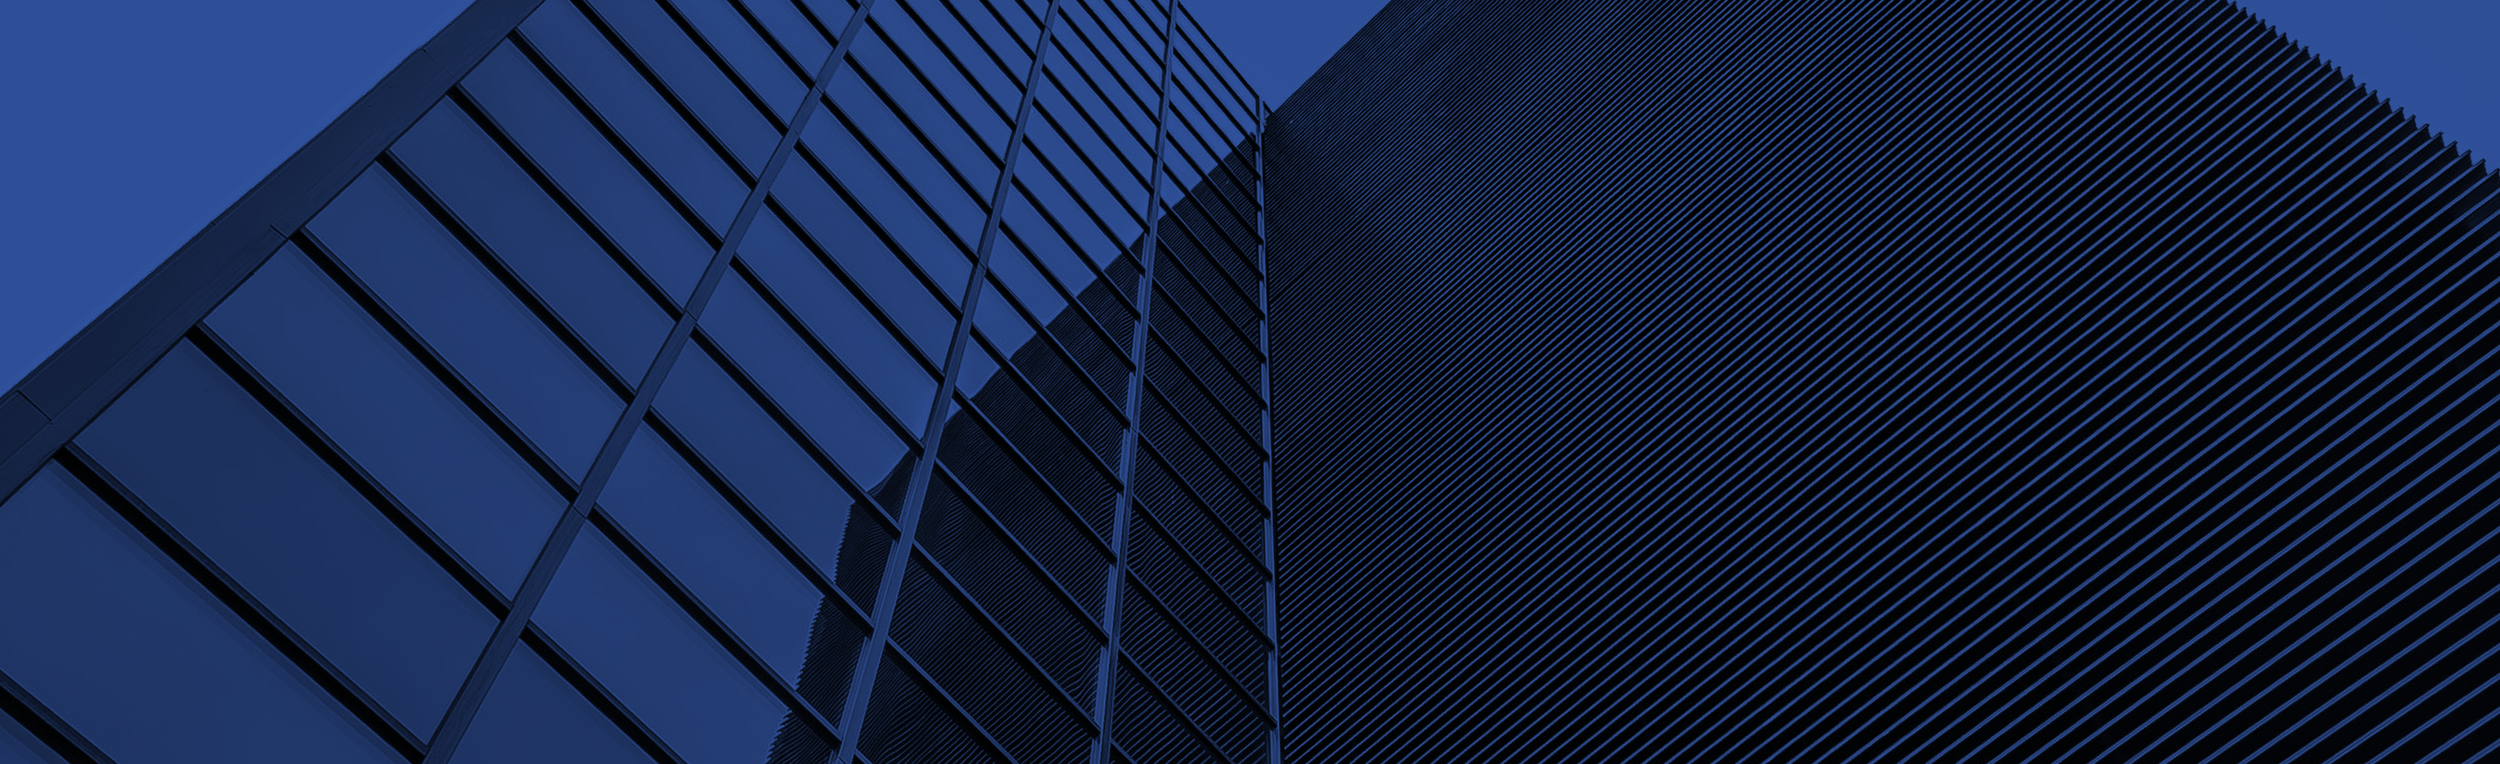 building-blue-2.png